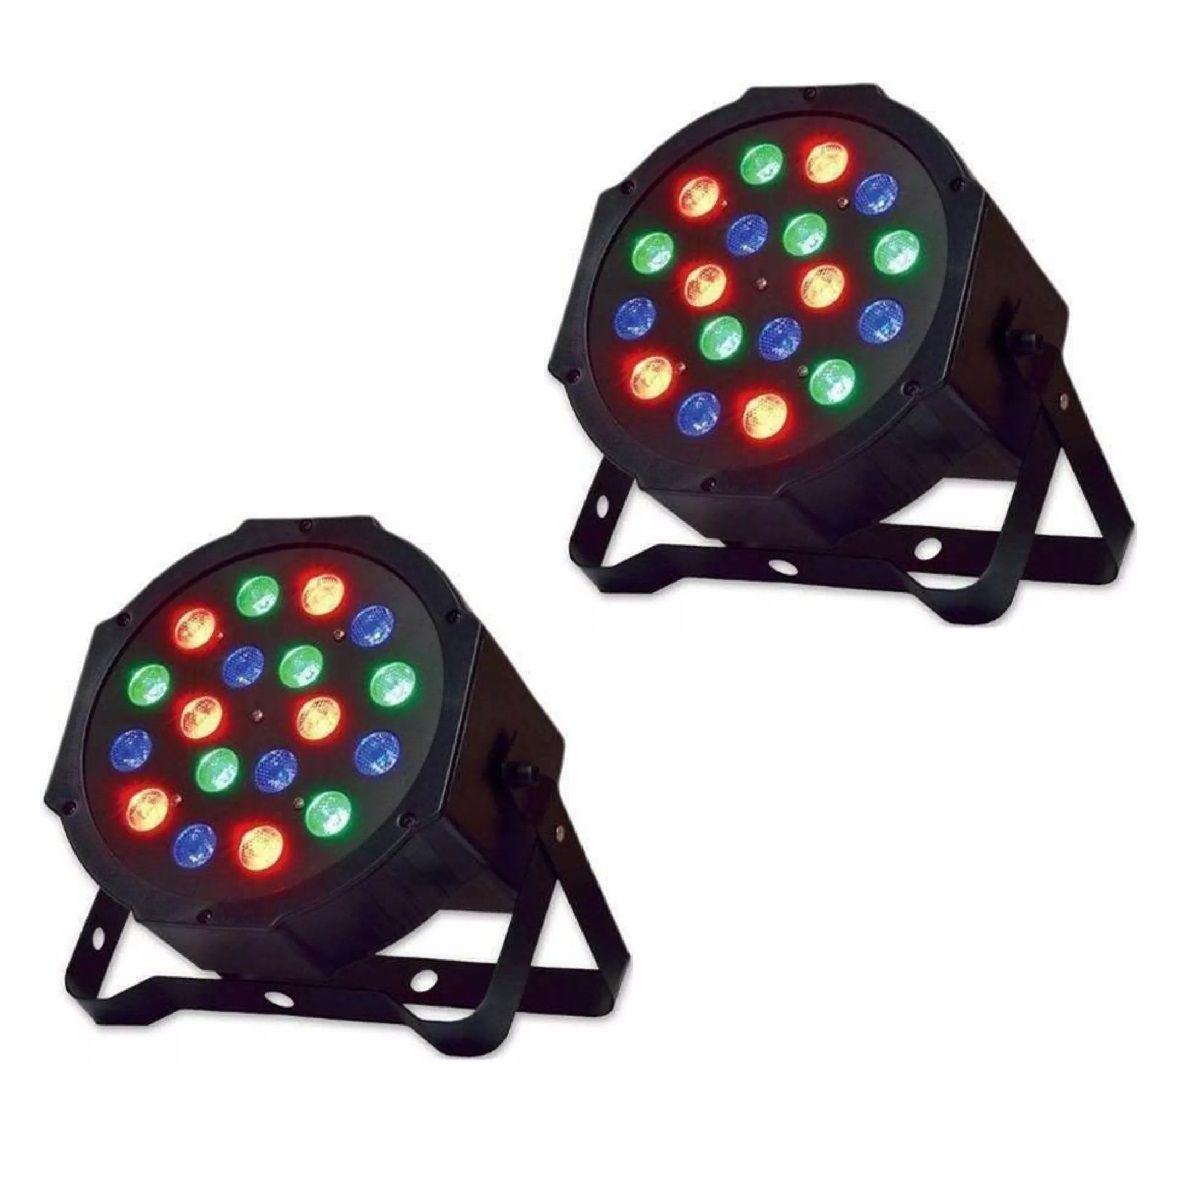 Kit 2x Canhão de Luz PAR 18 LEDs 1W RGB DMX Strobo Painel Digital